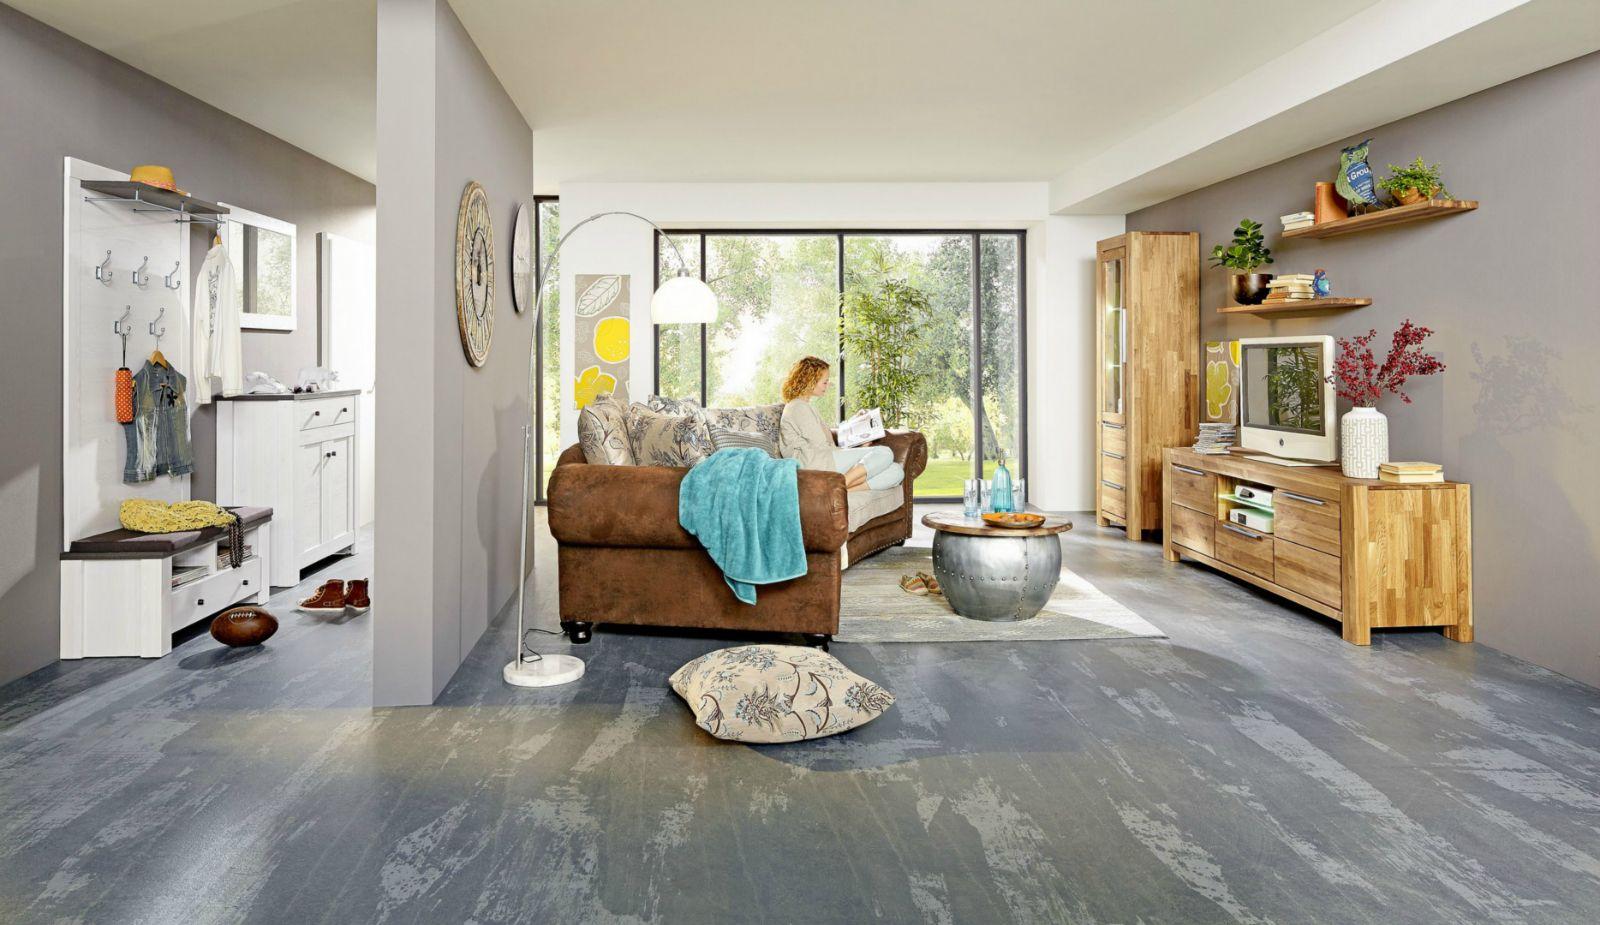 megasofa chalet luxusn sedac soupravy n bytek br ckl. Black Bedroom Furniture Sets. Home Design Ideas